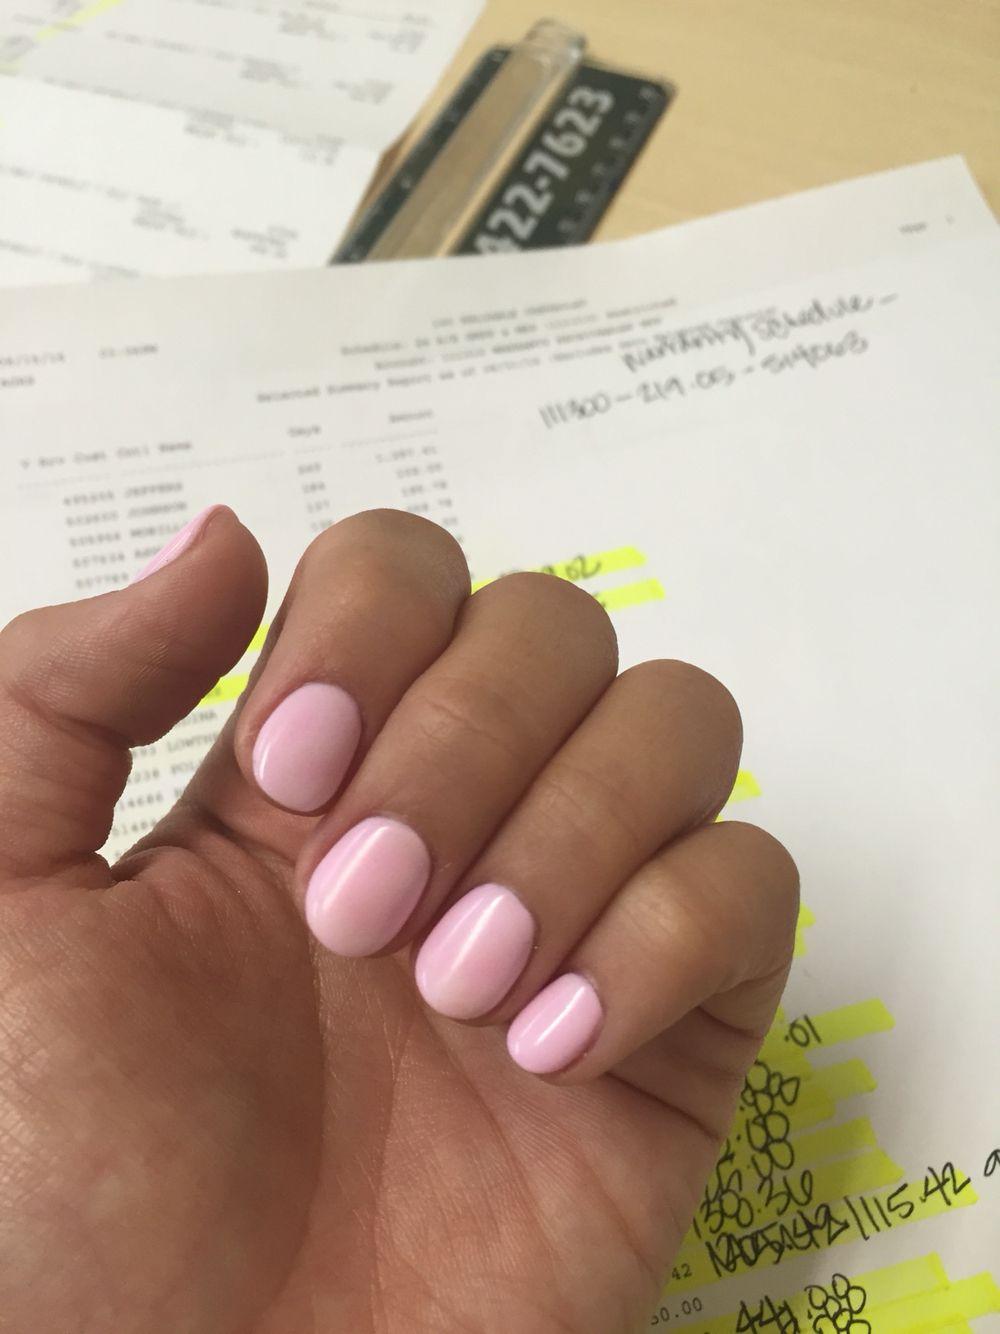 Short Round Nails Rounded Acrylic Nails Short Gel Nails Pink Acrylic Nails